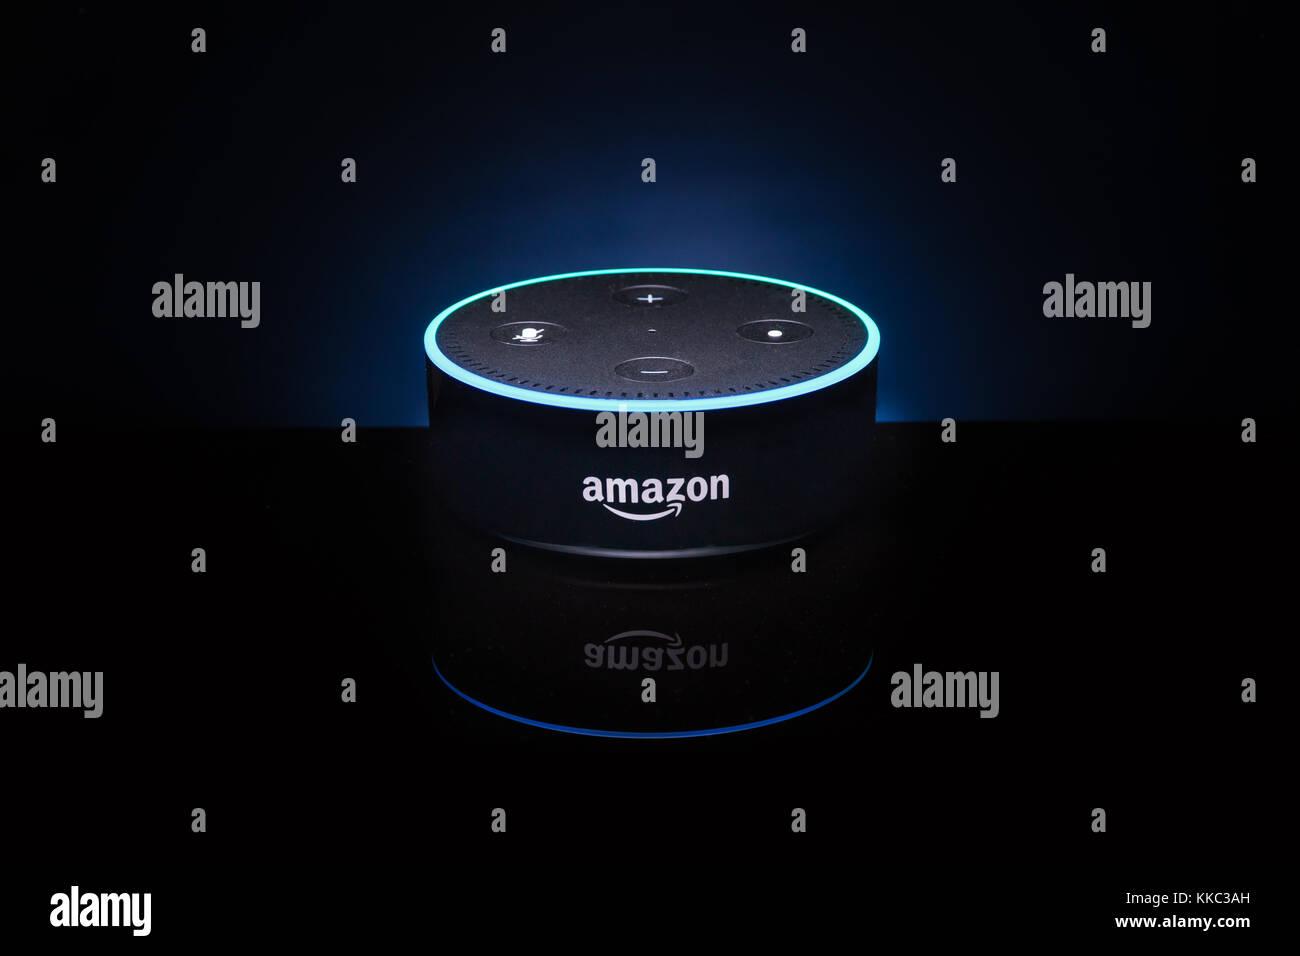 An Amazon 'Alexa' Echo Dot device - Stock Image